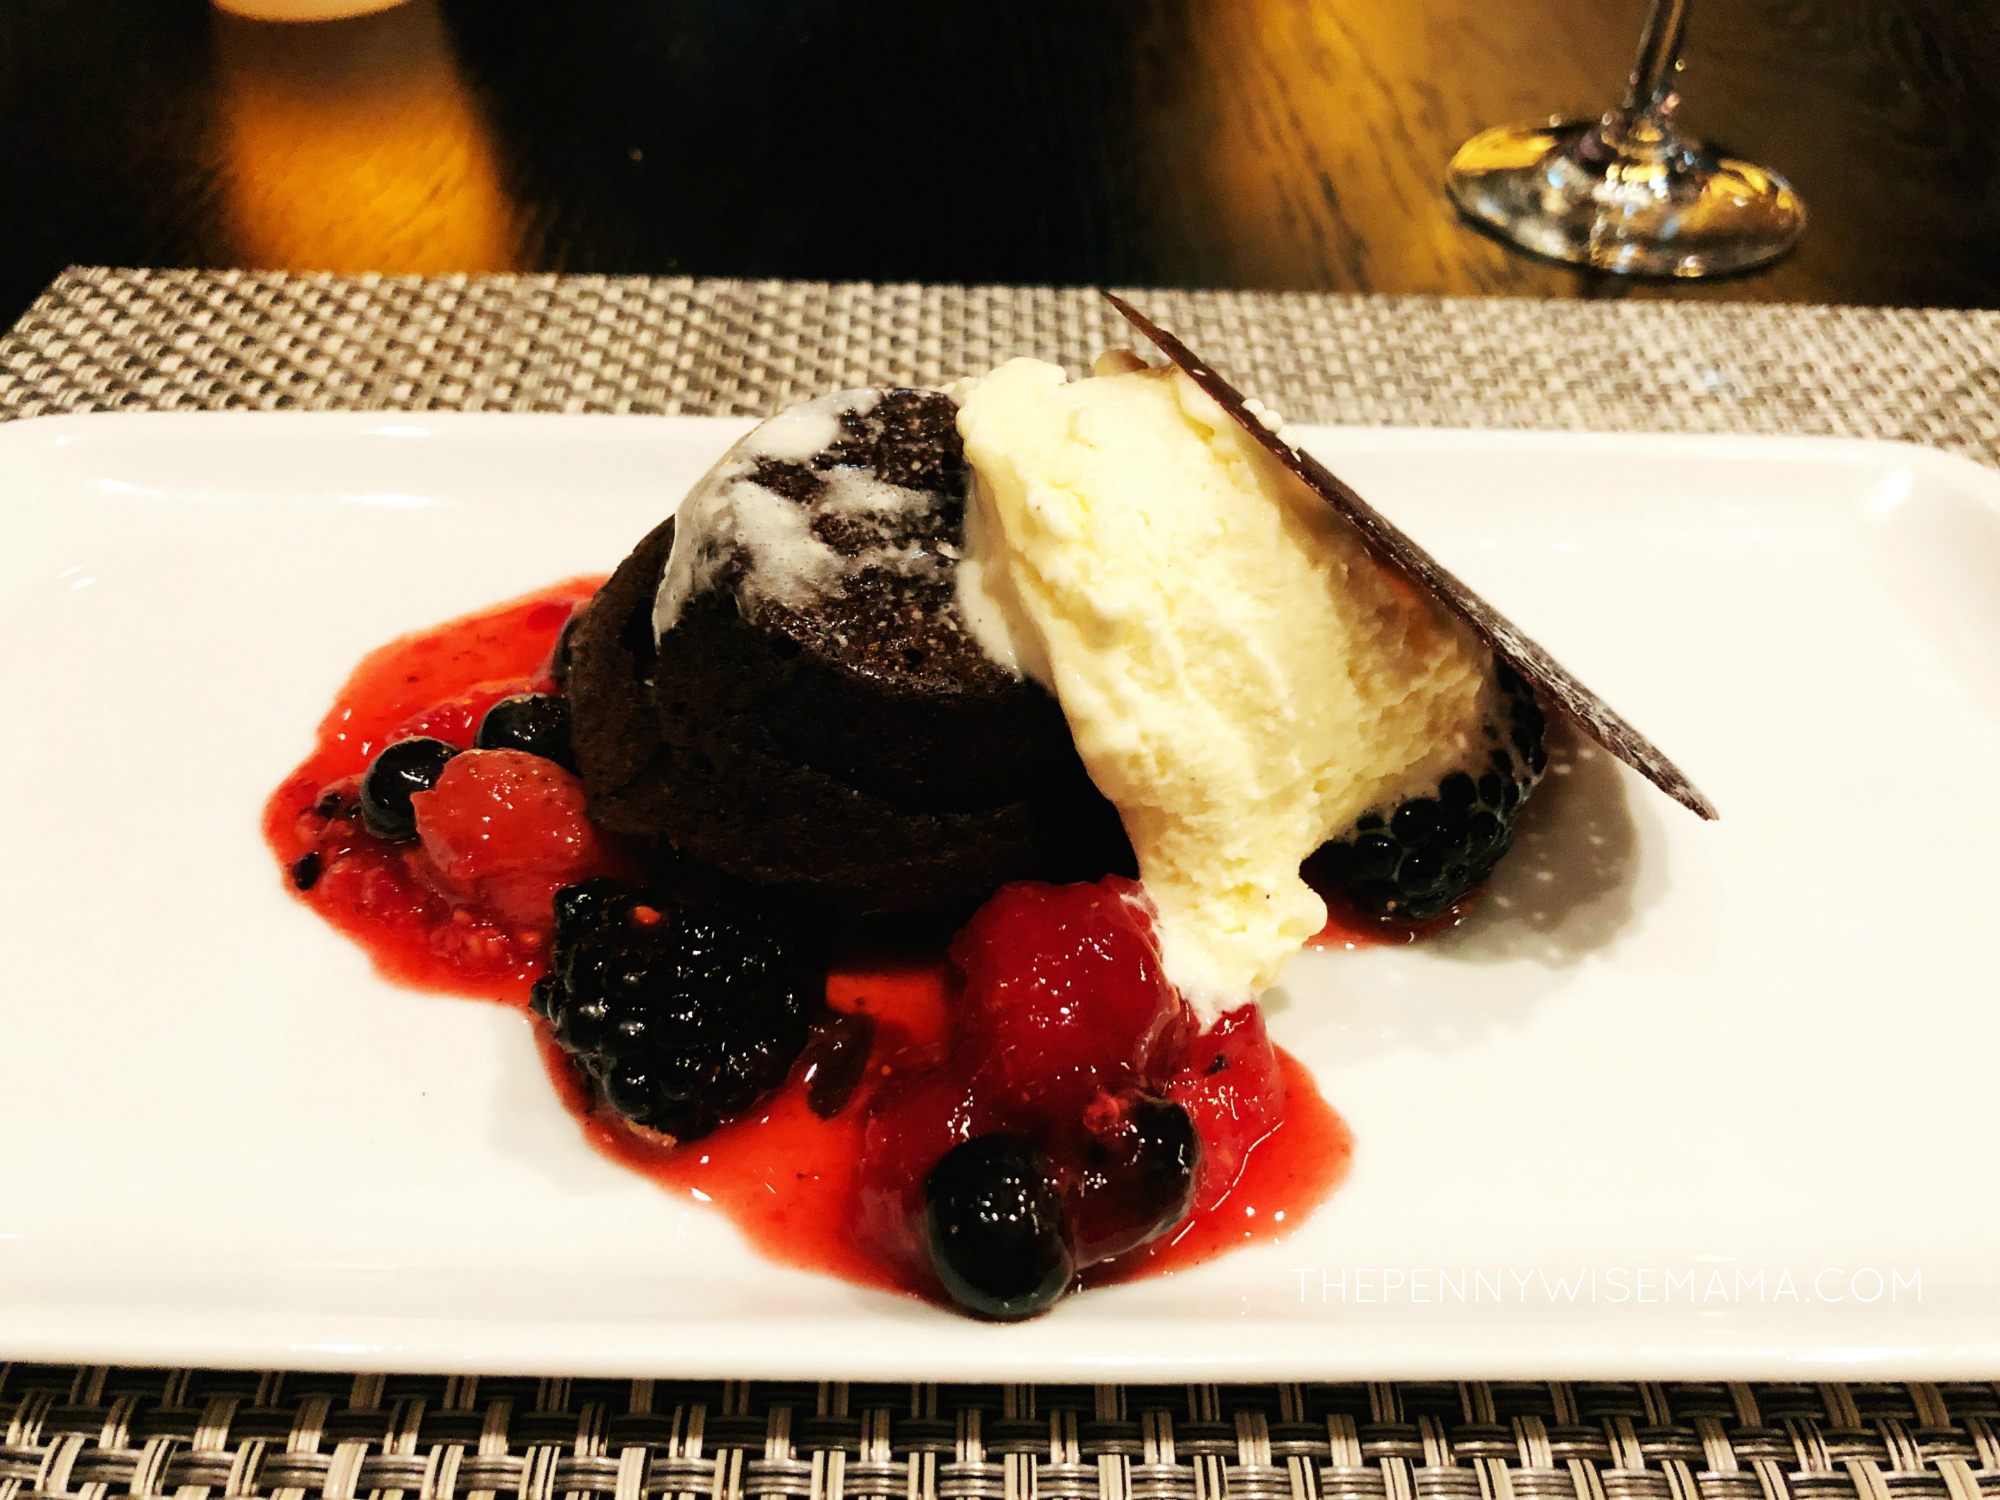 Royal Caribbean Symphony of the Seas - Chops Grille - Dessert